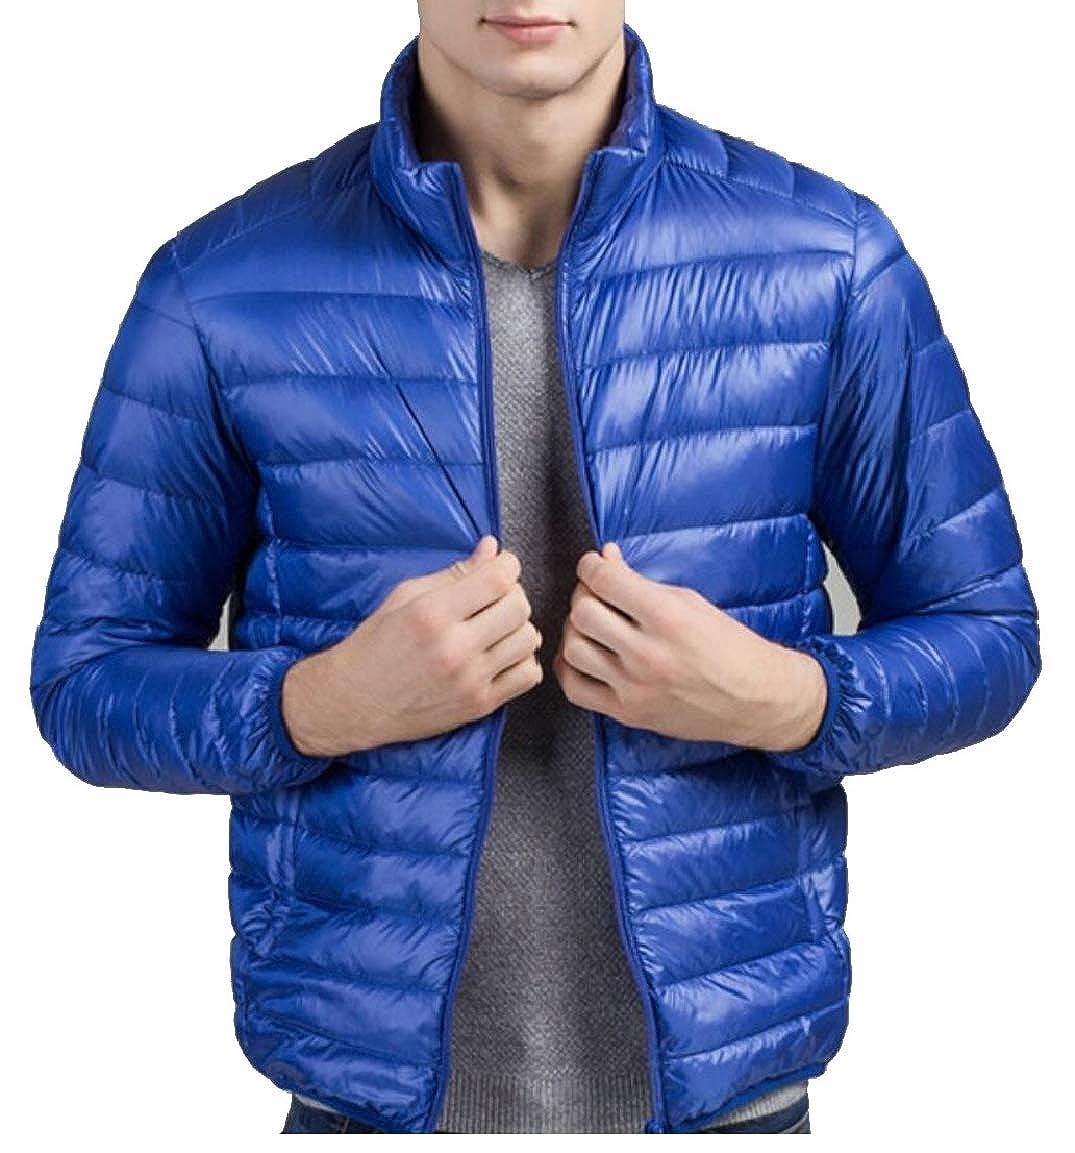 mydeshop Mens Packable Down Jacket Jacket